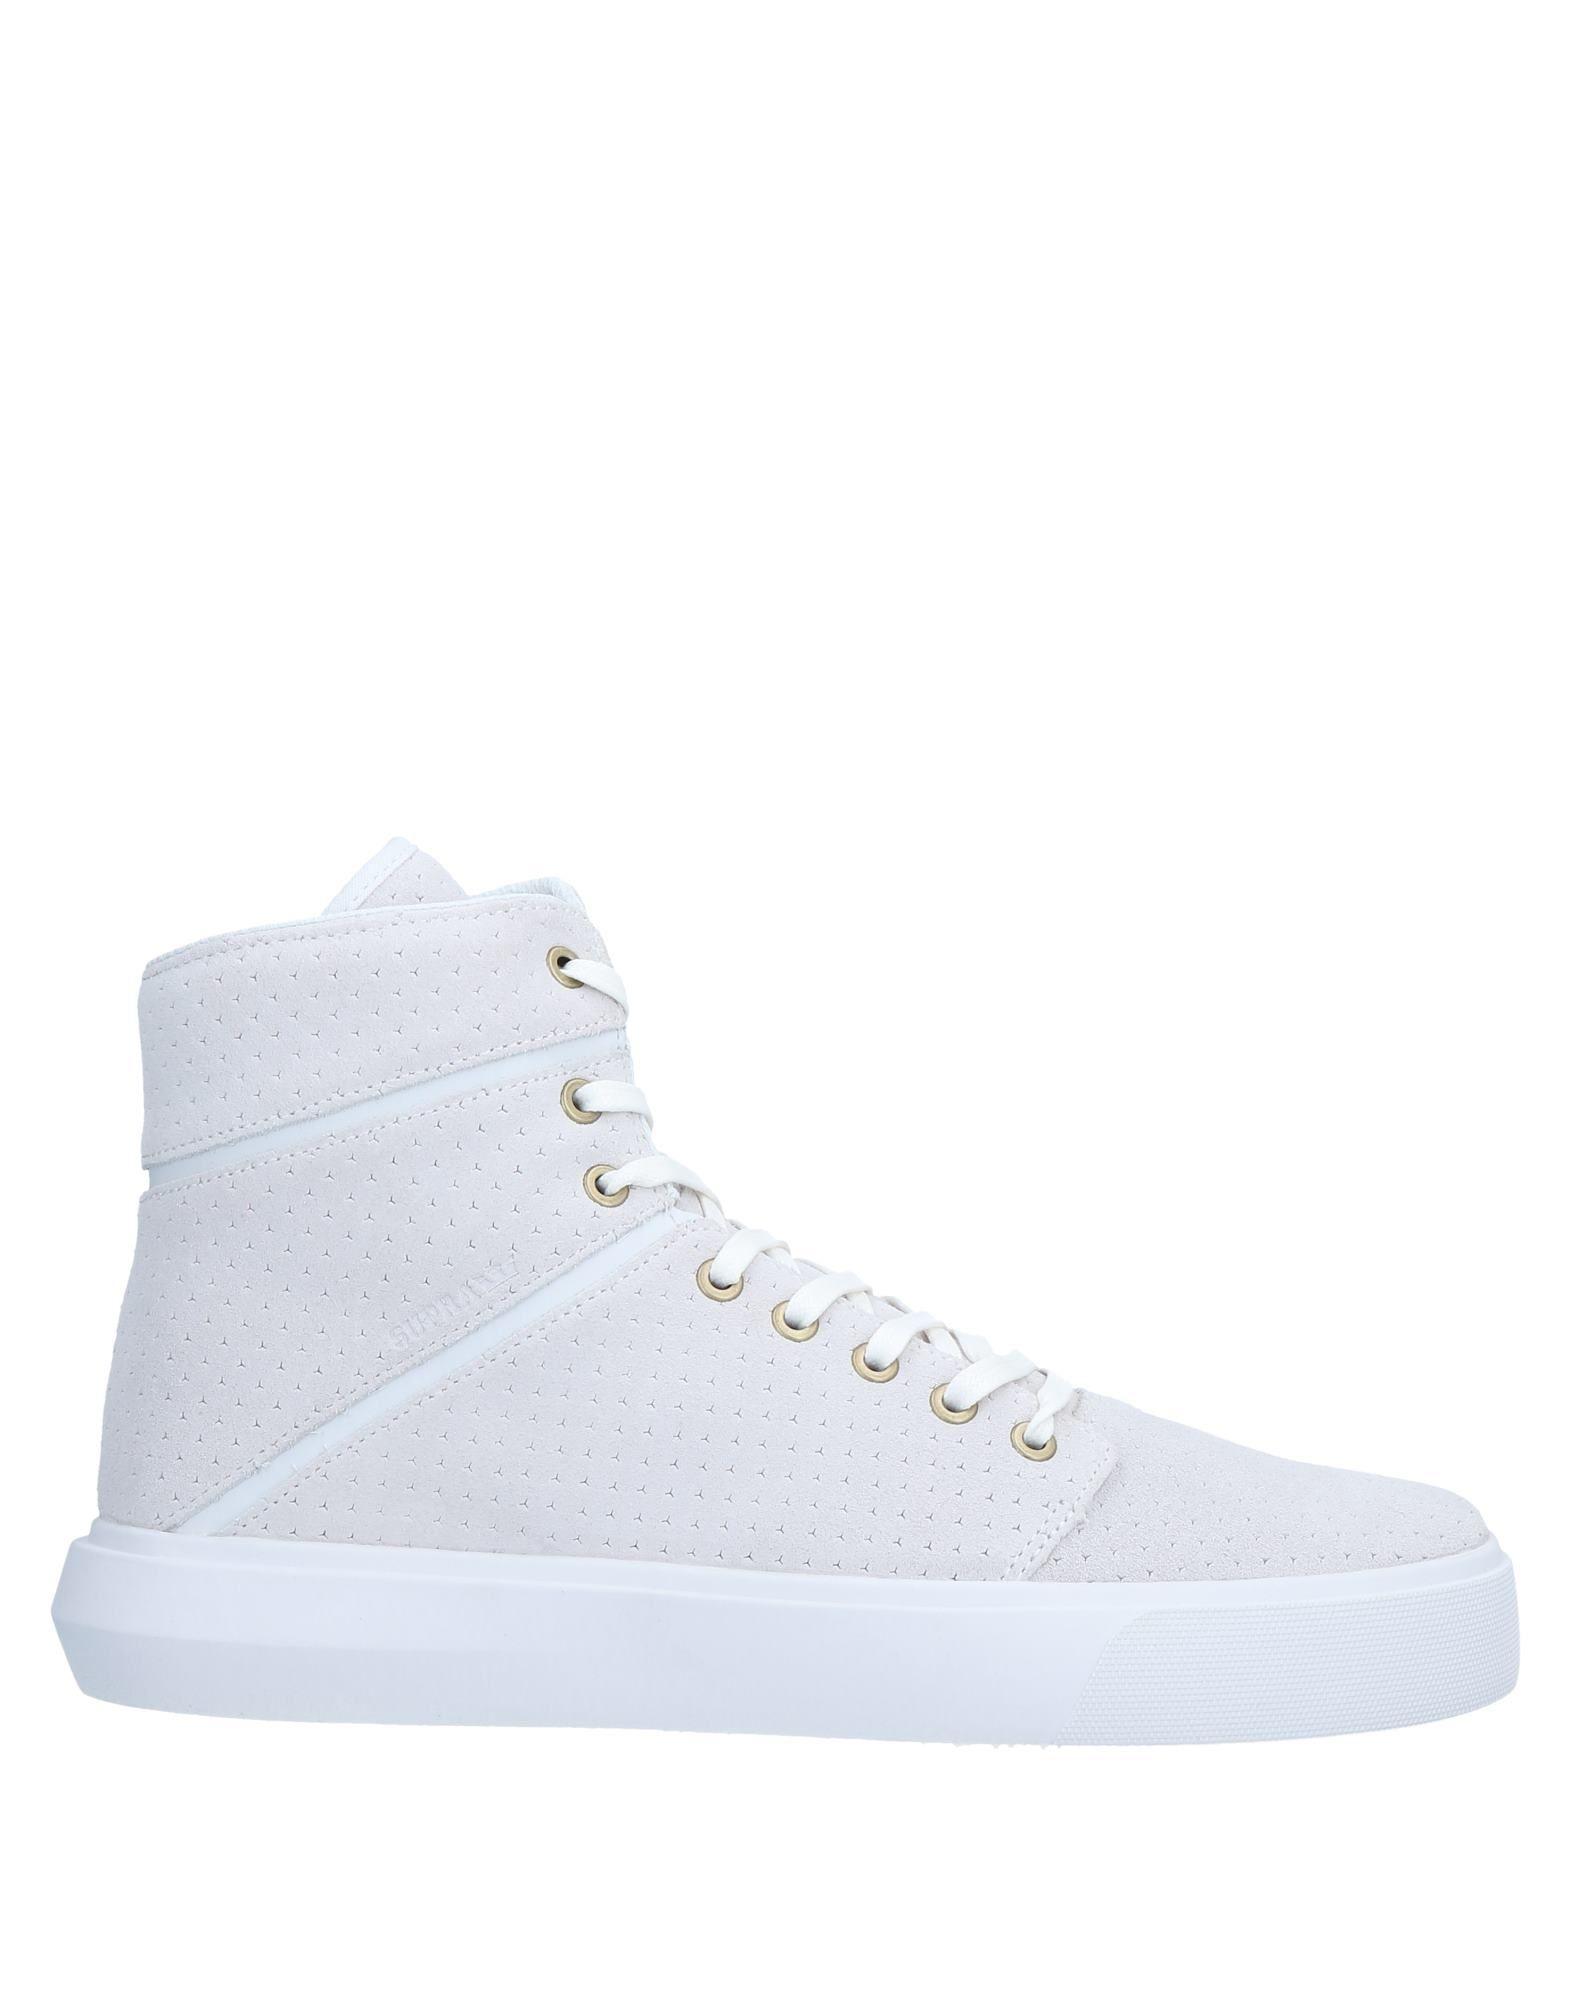 13cea2646198 Supra High-tops   Sneakers in Gray for Men - Lyst